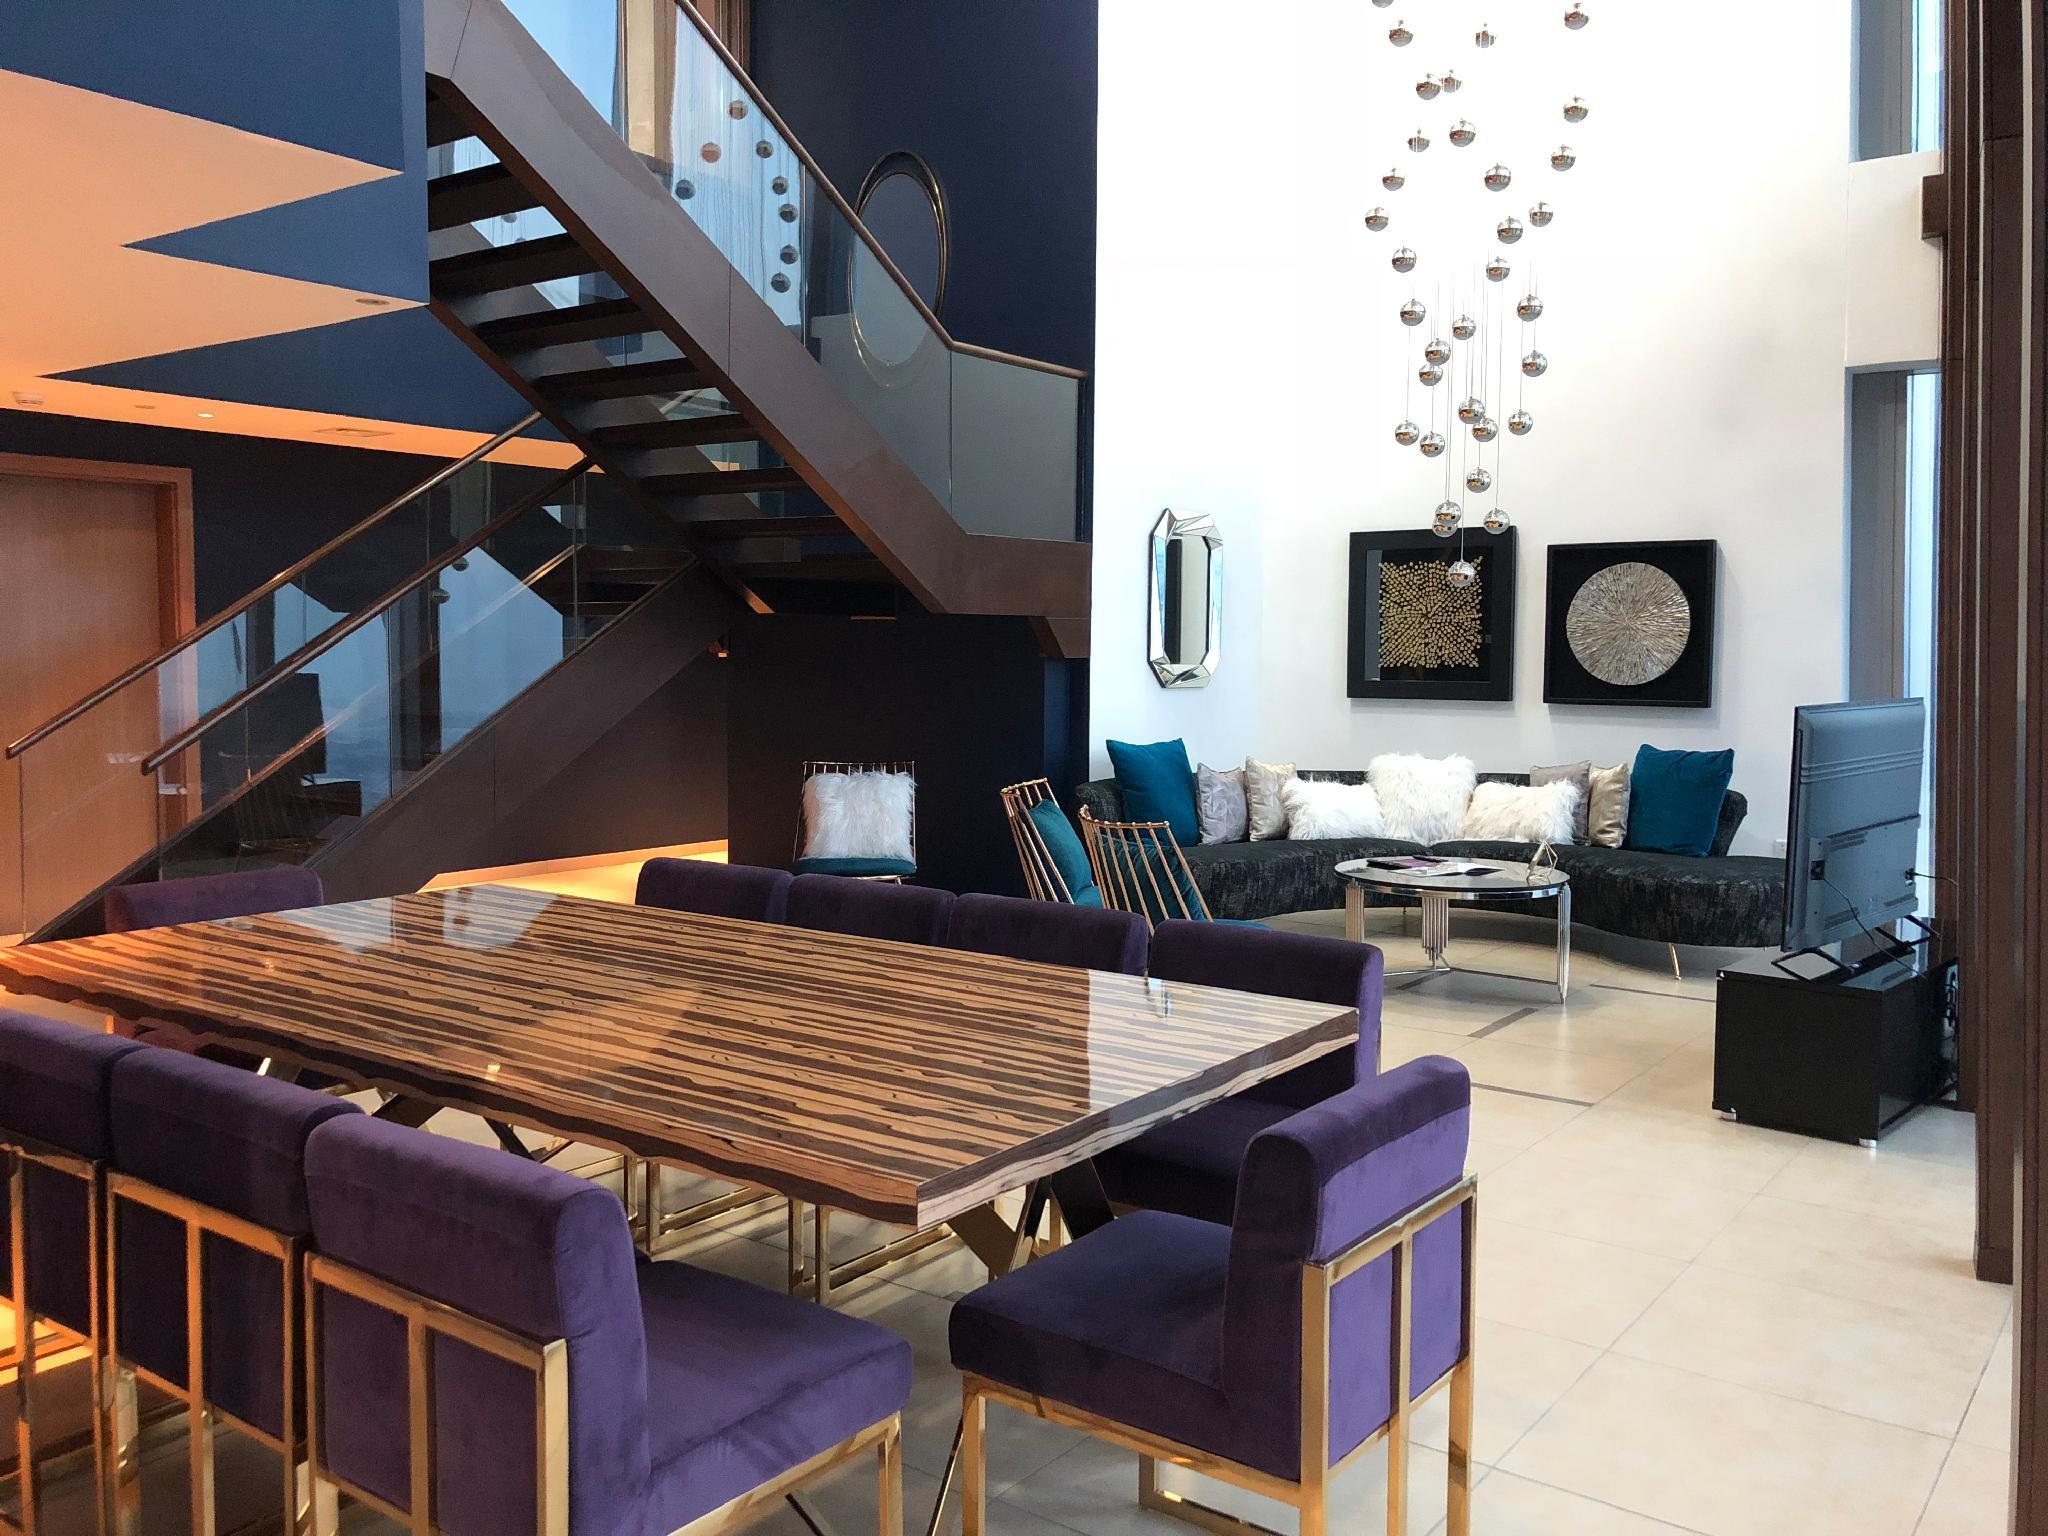 Dream Inn   48 Burj Gate   5BR Penthouse Apartment